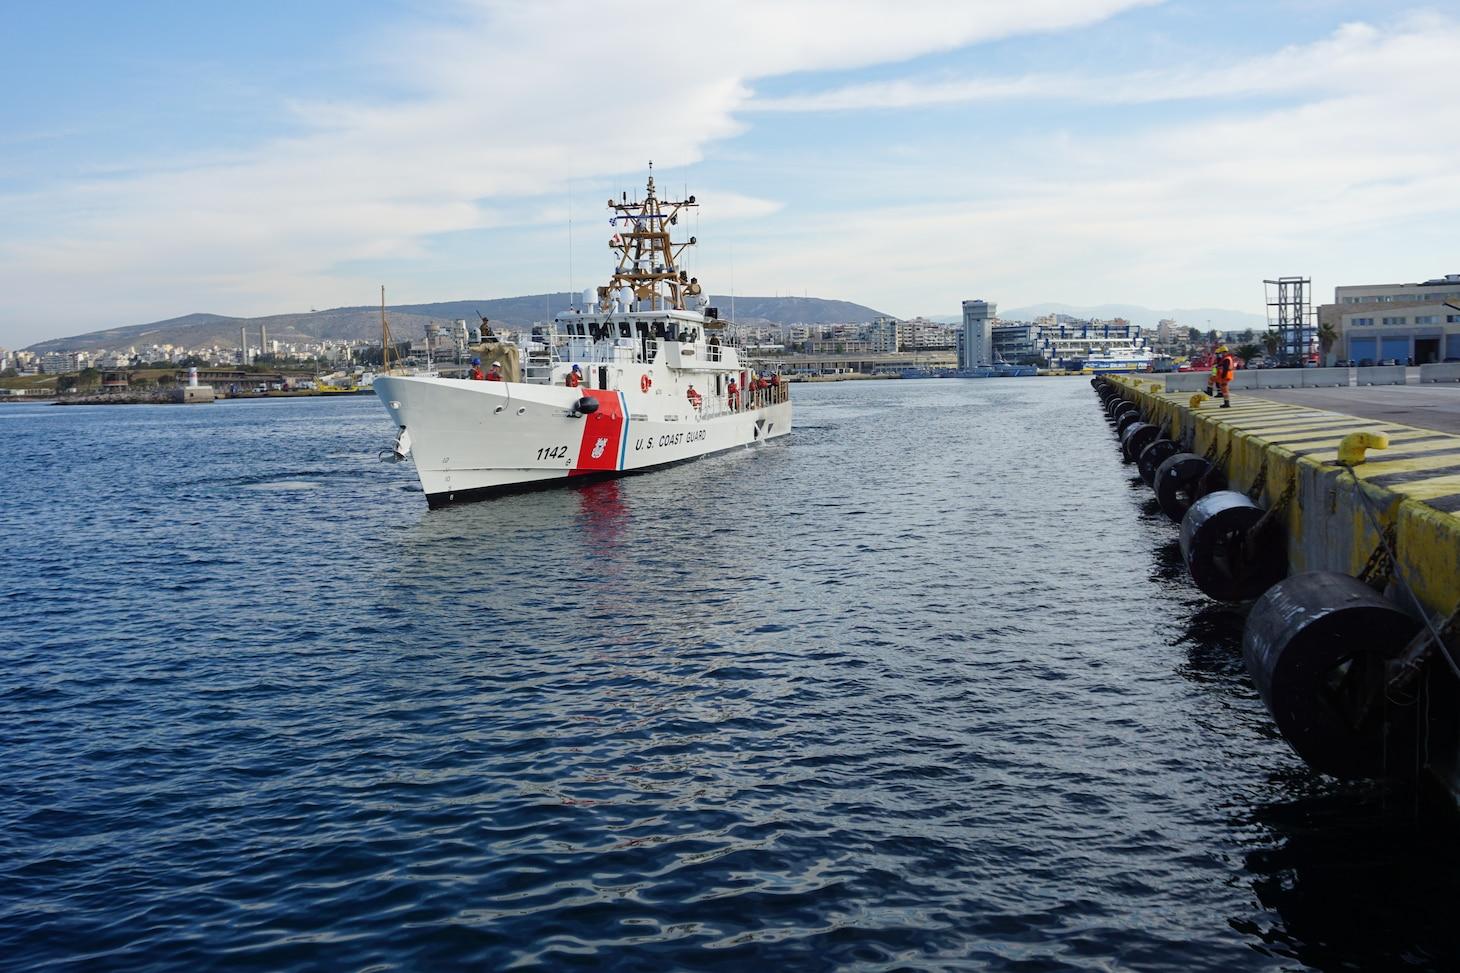 USCGC Robert Goldman (WPC 1142) arrives in Athens, Greece on April 26, 2021.